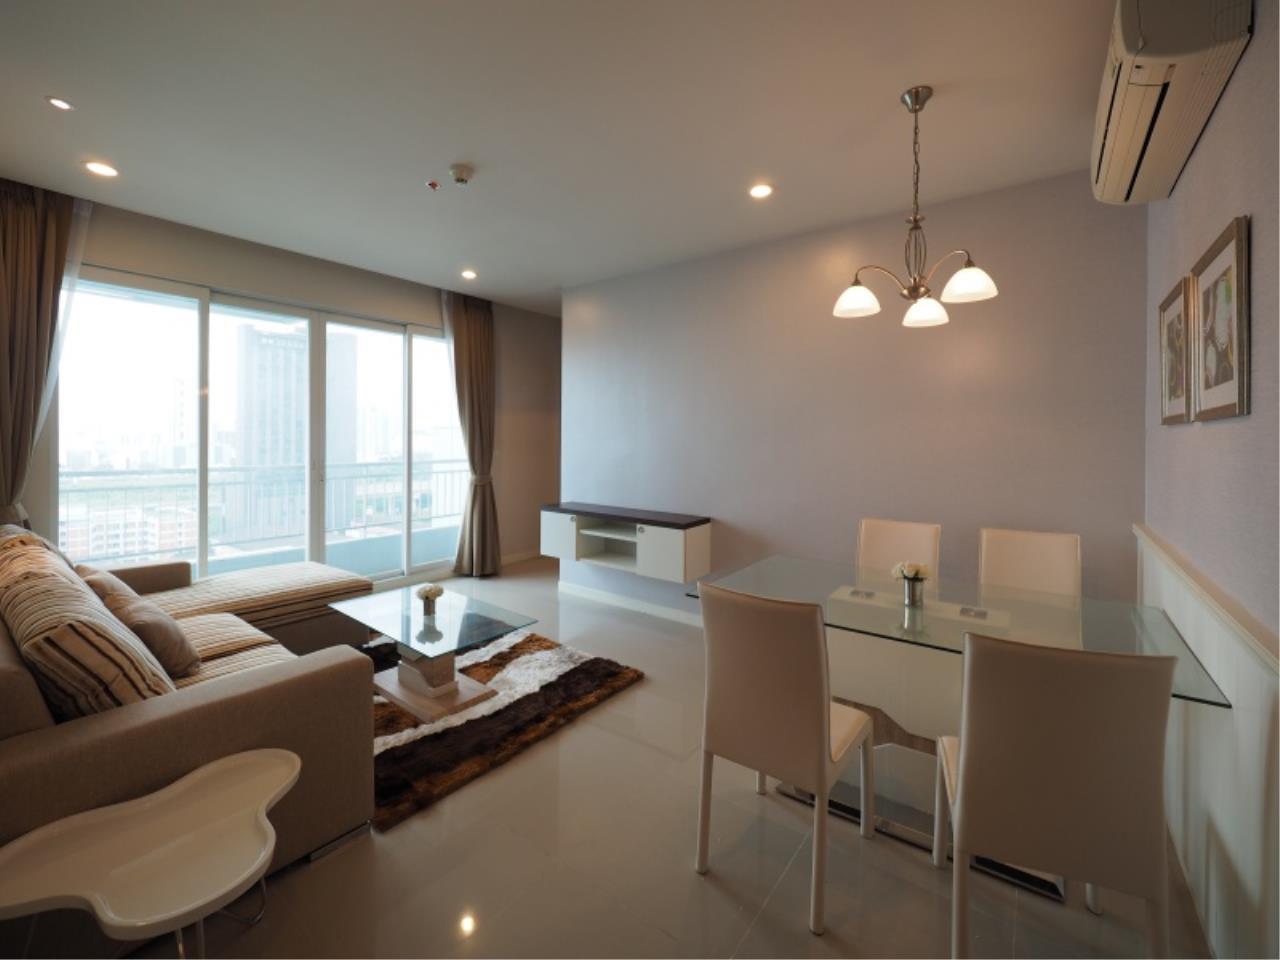 Century21 Skylux Agency's Circle Condominium / Condo For Rent / 1 Bedroom / 46 SQM / MRT Phetchaburi / Bangkok 3